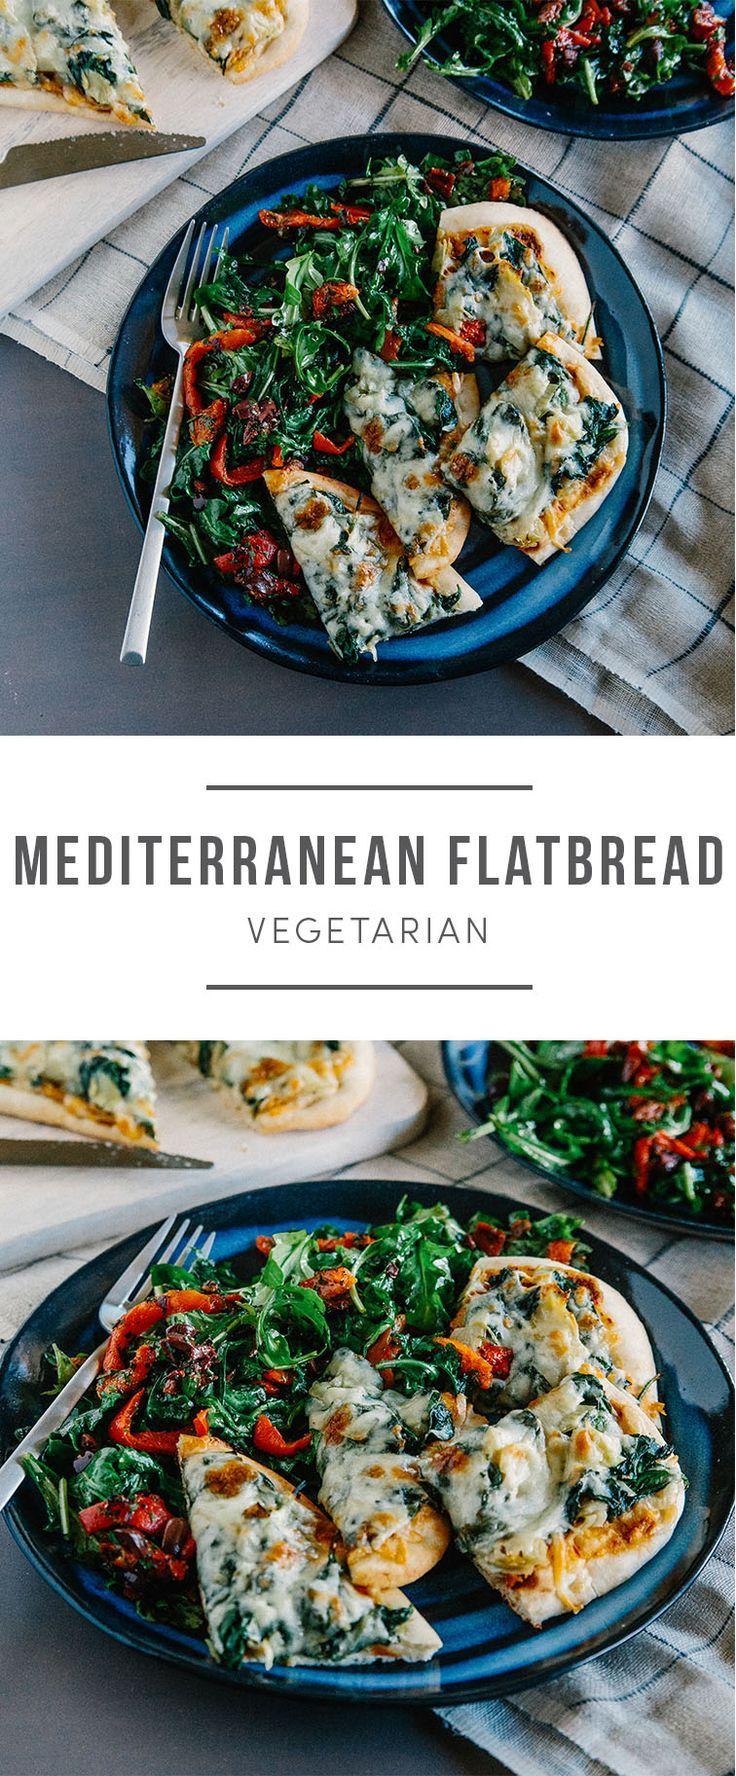 Mediterranean flatbread recipes. Artichokes, spinach, arugula and olives. Recipe here: https://greenchef.com/recipes/spinach-and-artichoke-flatbread-with-red-pepper-peperonata-and-arugula?utm_source=pinterest&utm_medium=link&utm_campaign=social&utm_conten